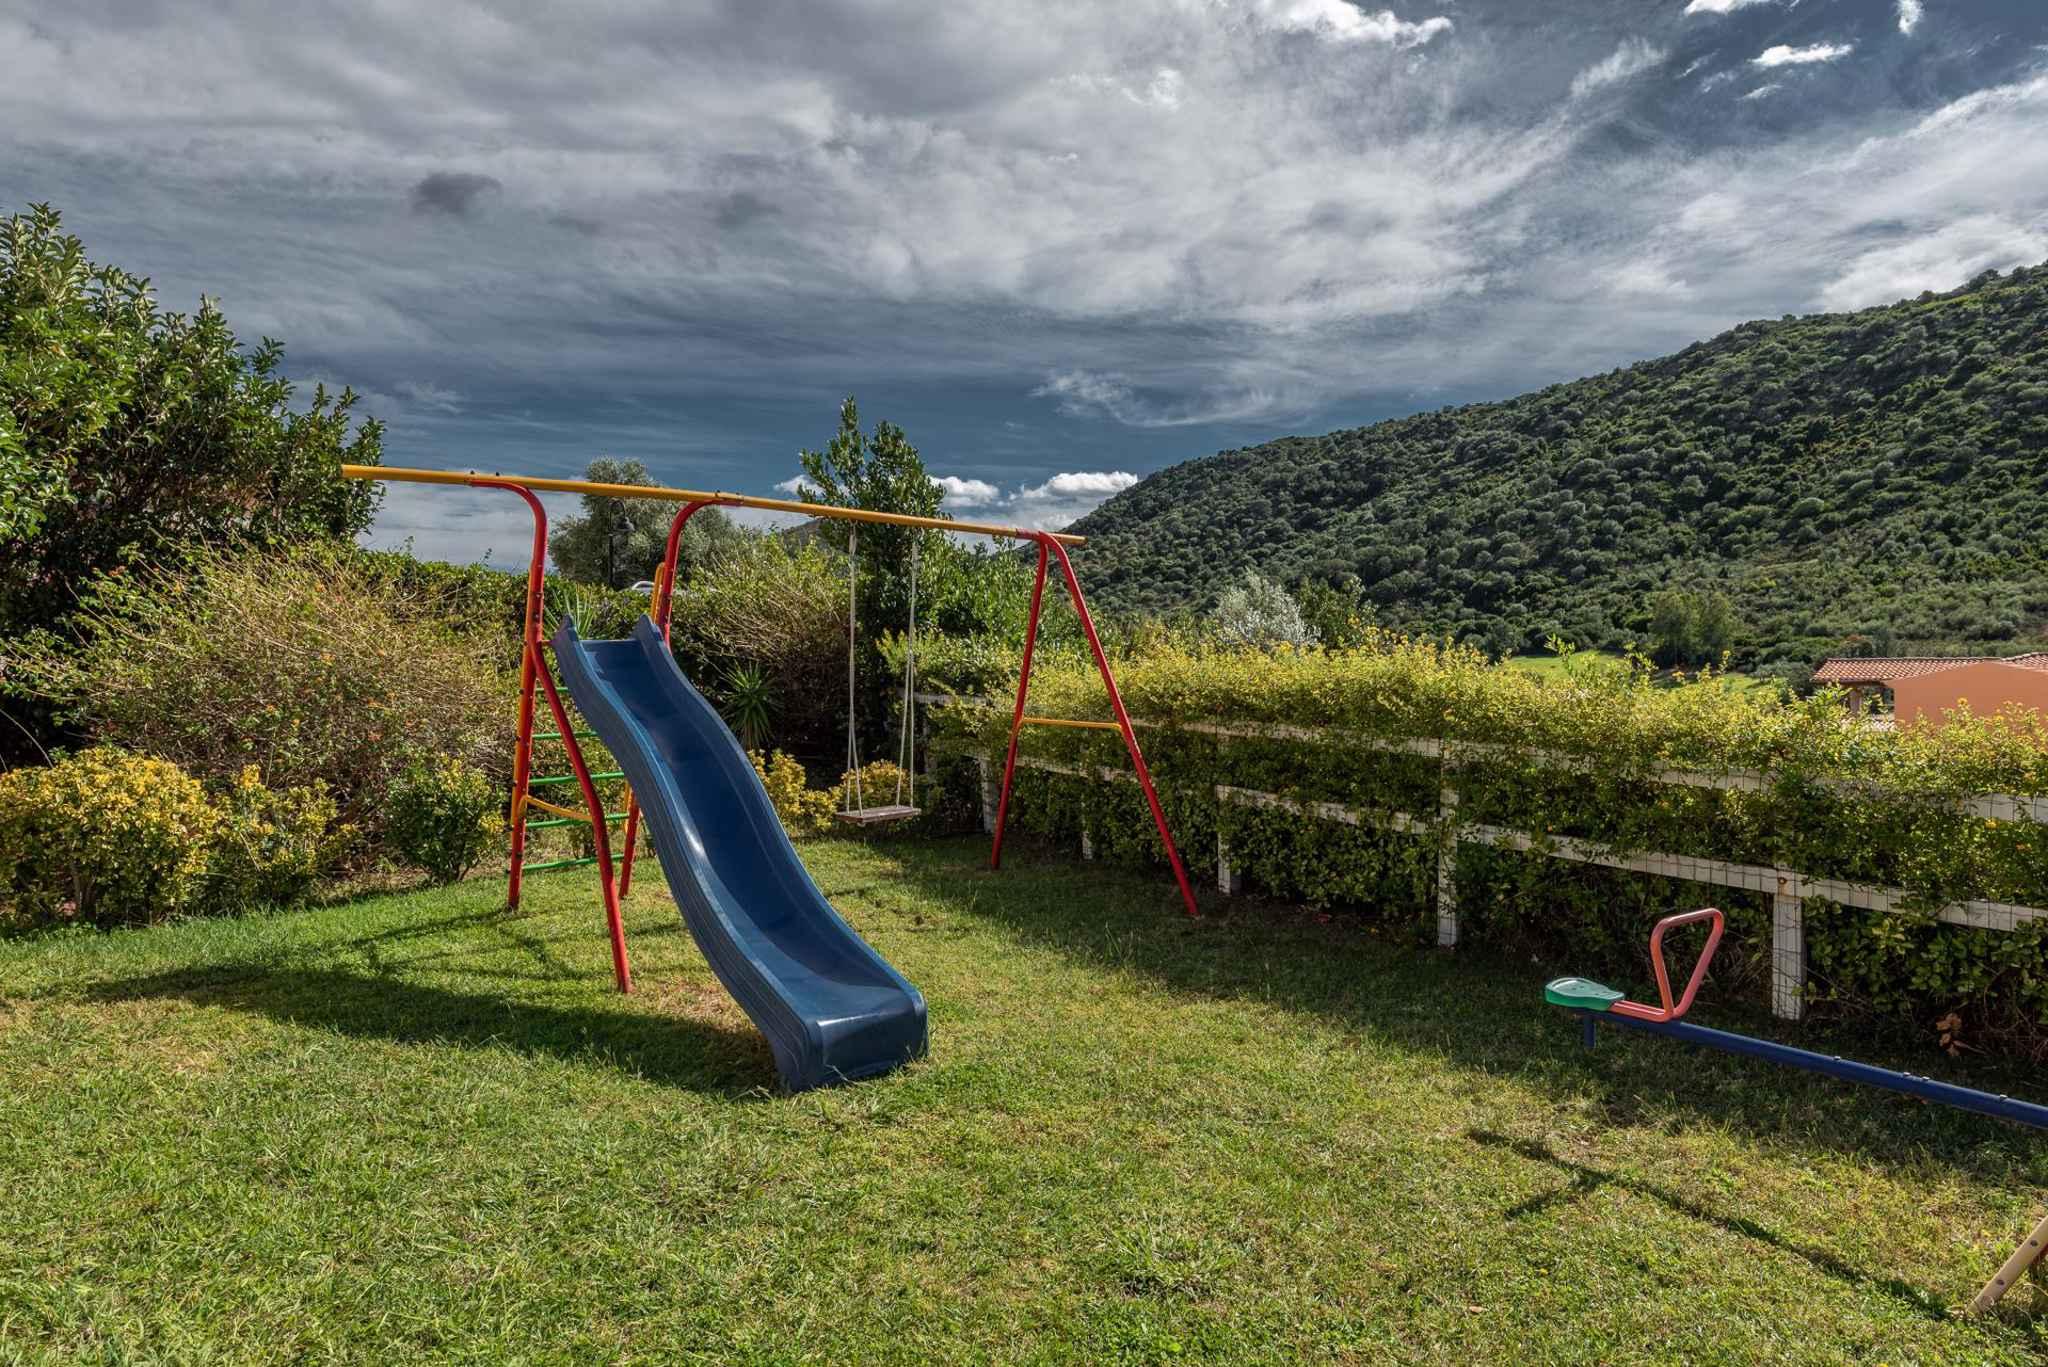 Ferienwohnung con piscina ed aria condizionata (2218559), Budoni, Olbia-Tempio, Sardinien, Italien, Bild 14